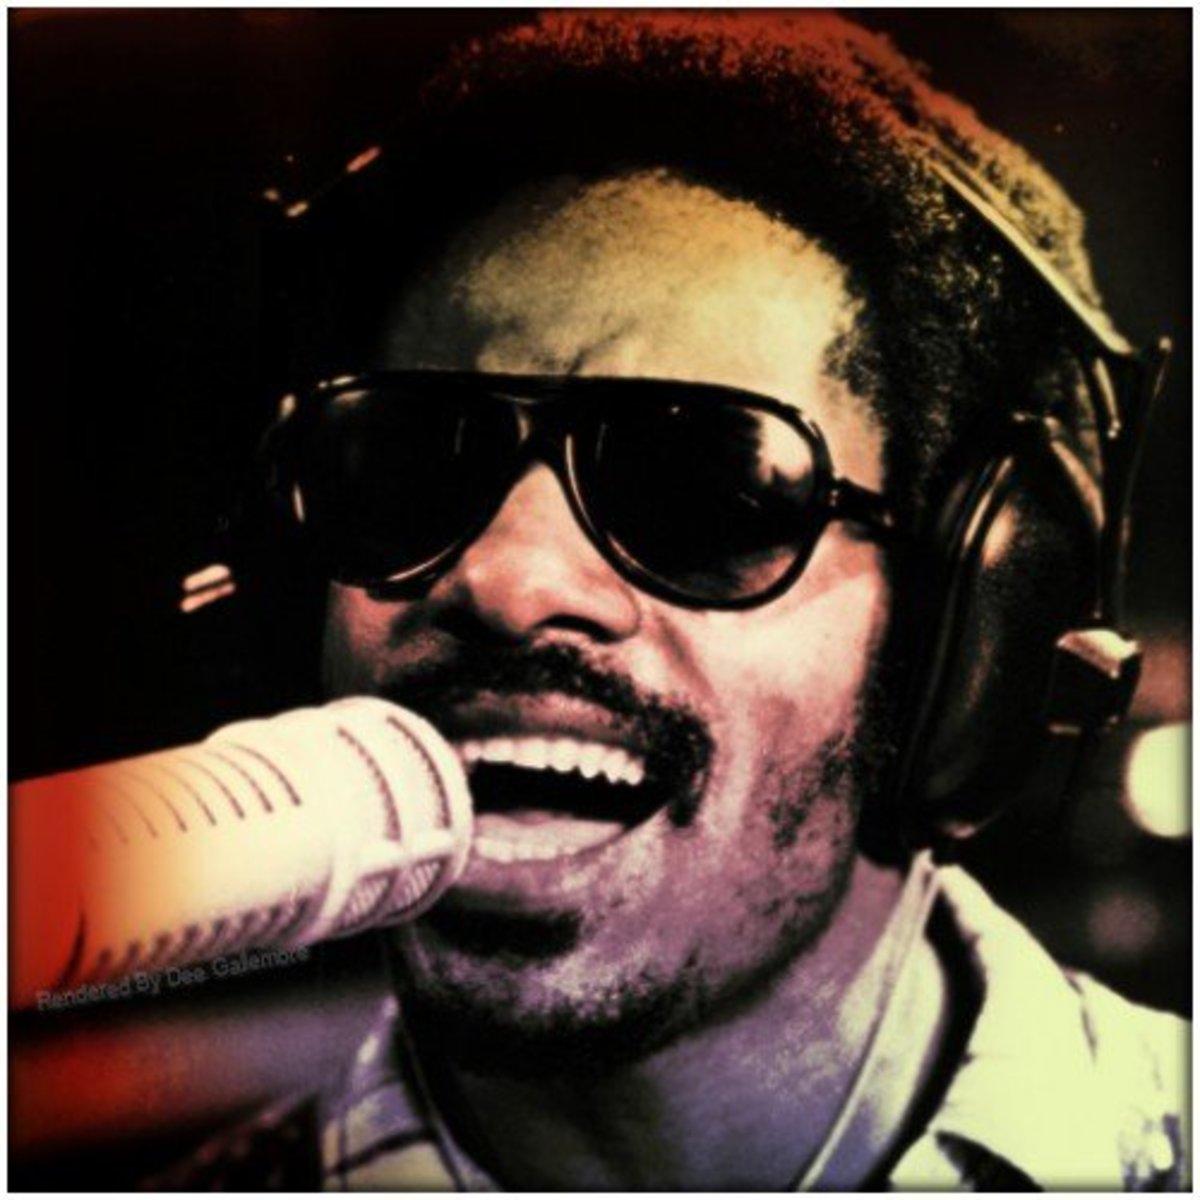 Stevie Wonder - 1970s